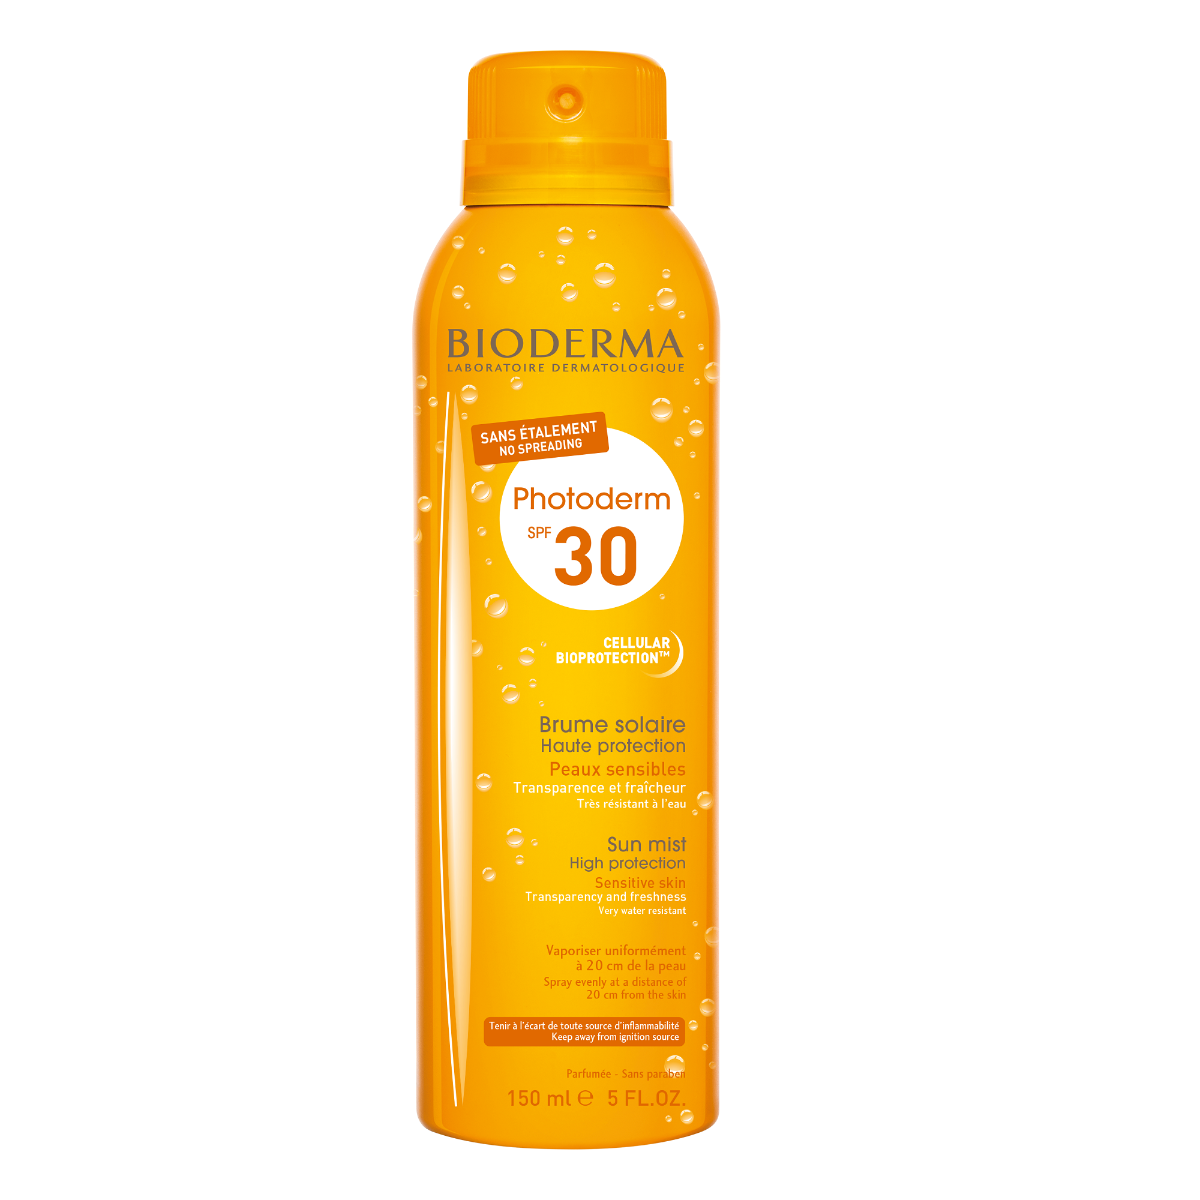 Spray protectie solara SPF 30 Photoderm Brume, 150ml, Bioderma